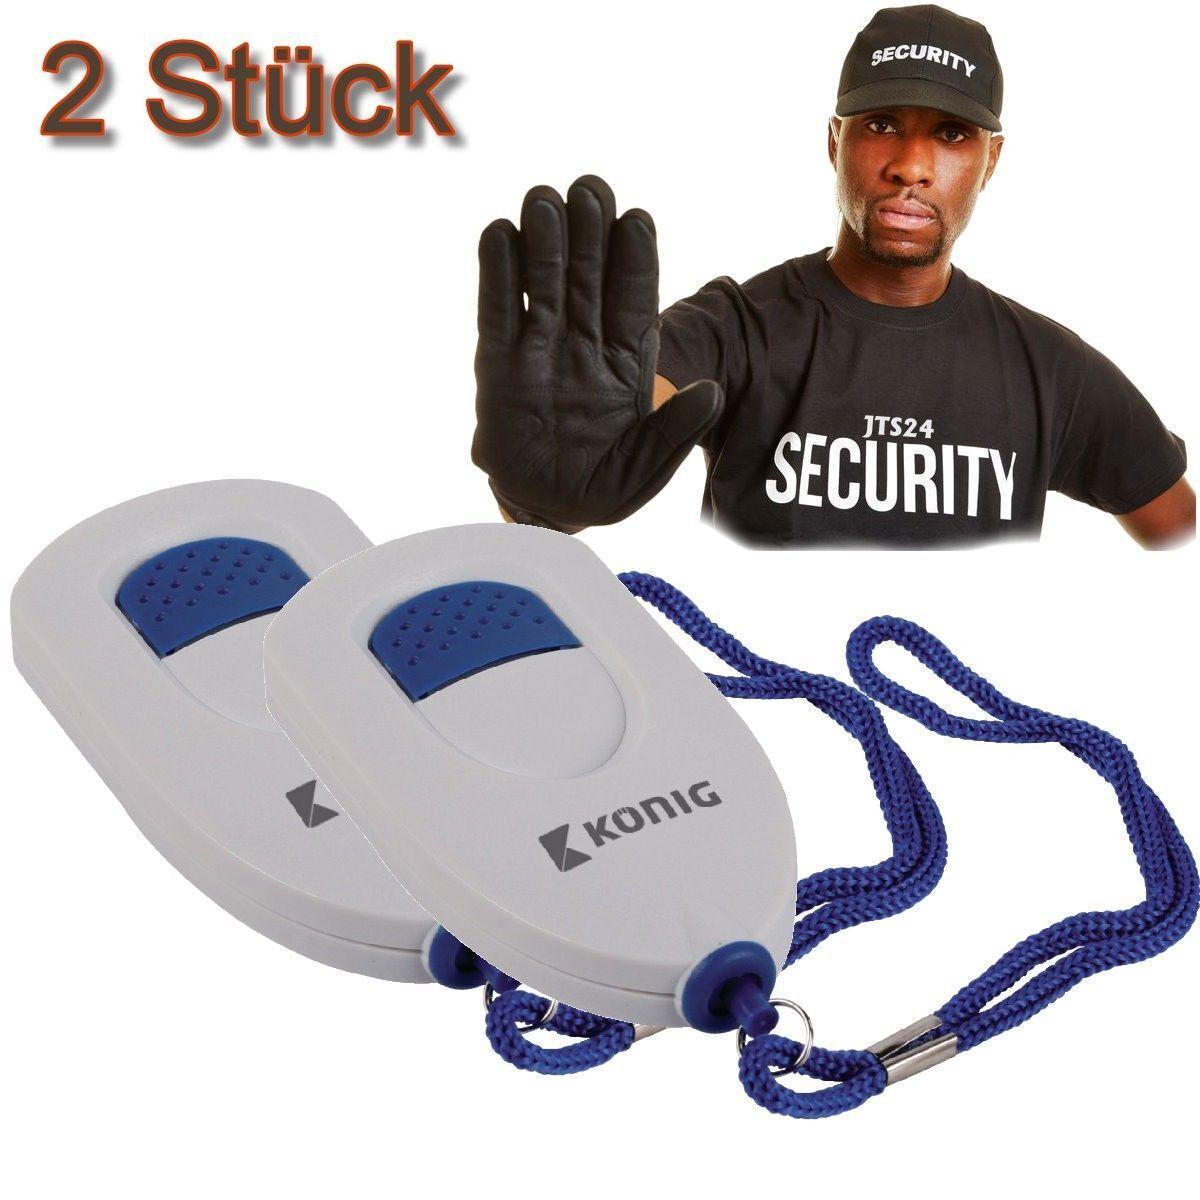 2 KÖNIG Sirene Panik Alarm Hand Tasche Sicherheitsalarm Personenalarm Panikalarm